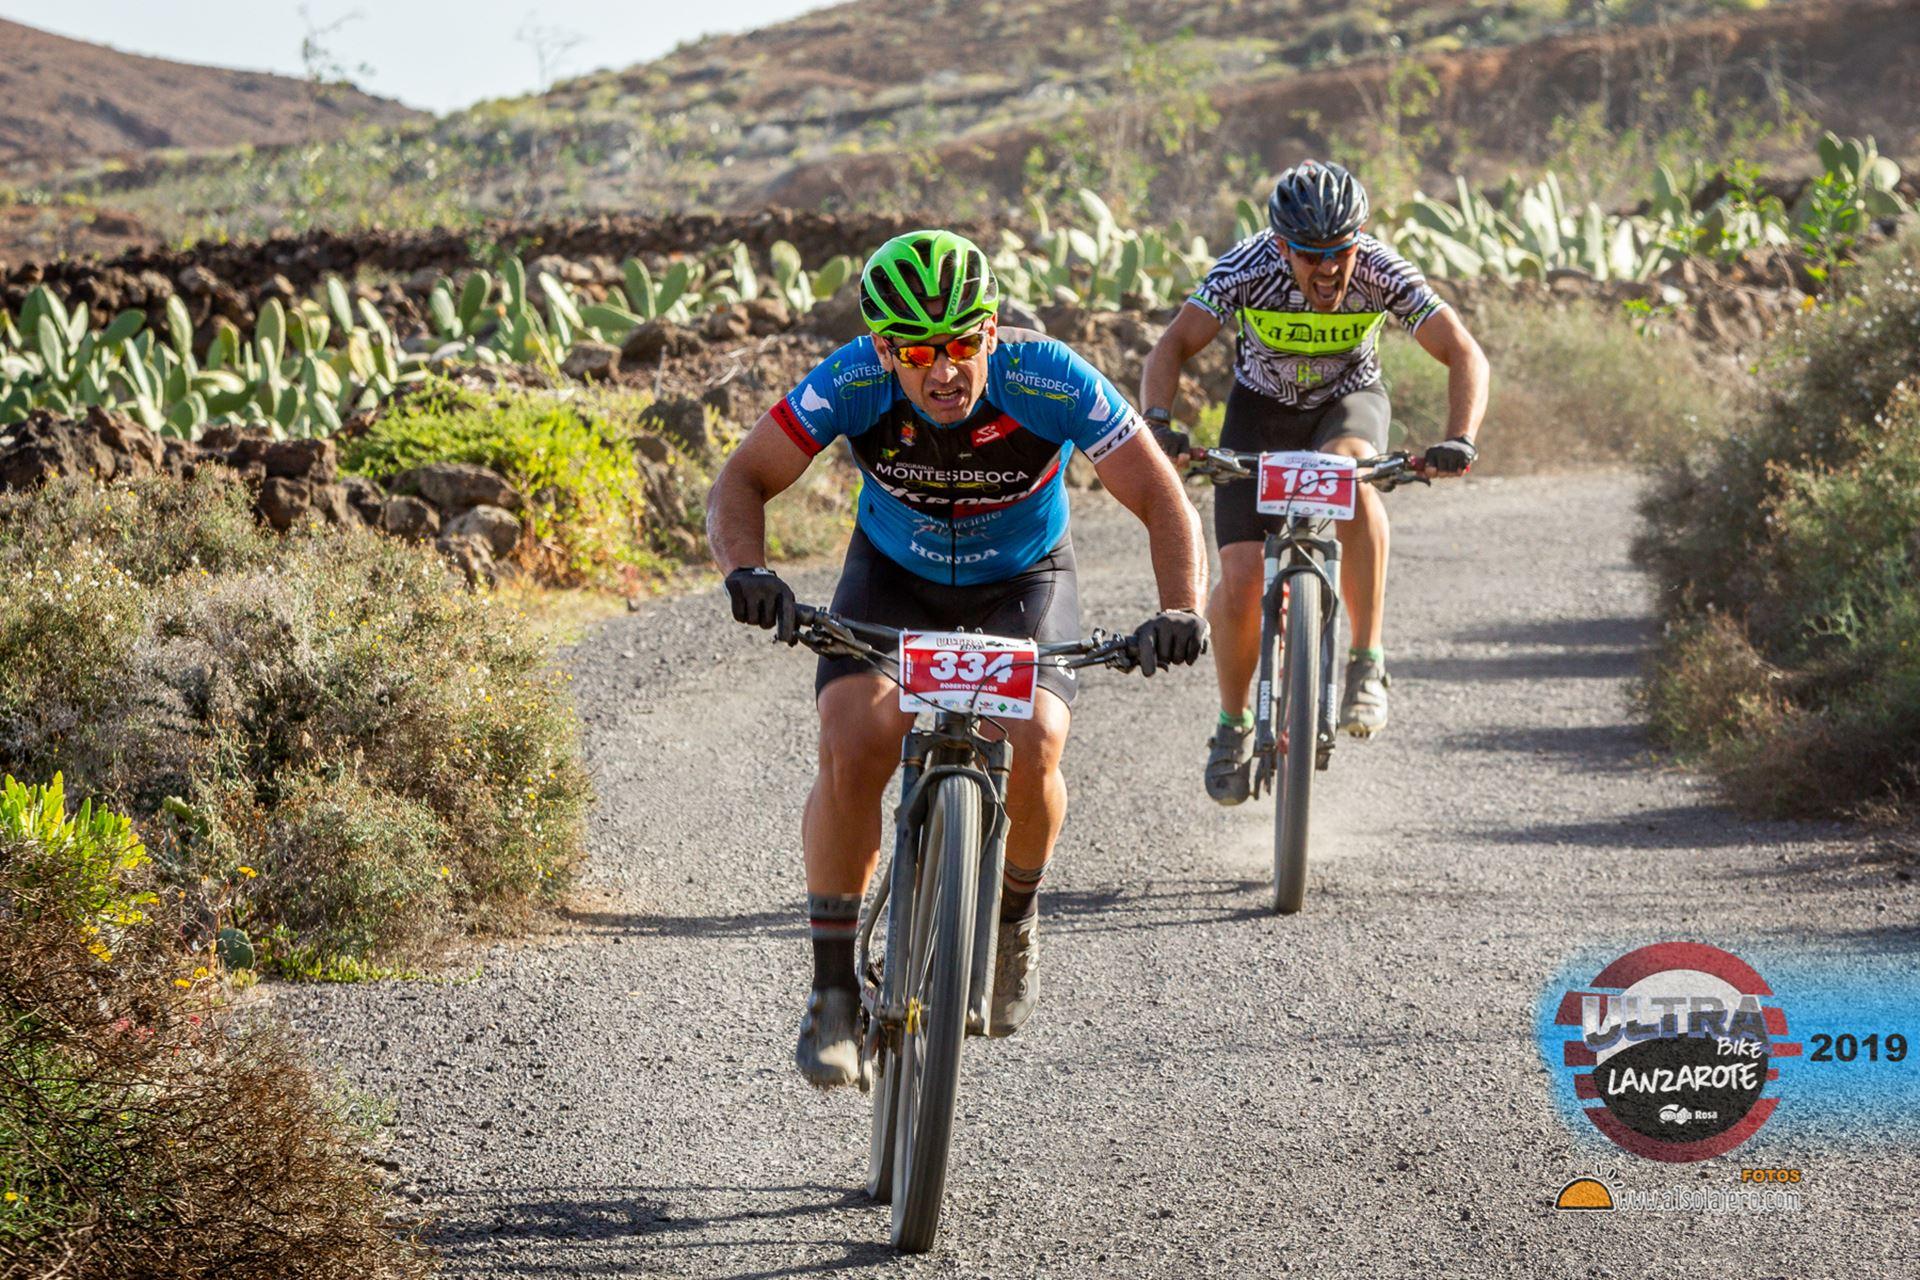 Sector Guatiza 2ª Etapa Ultrabike 2019 Fotos Alsolajero.com-34